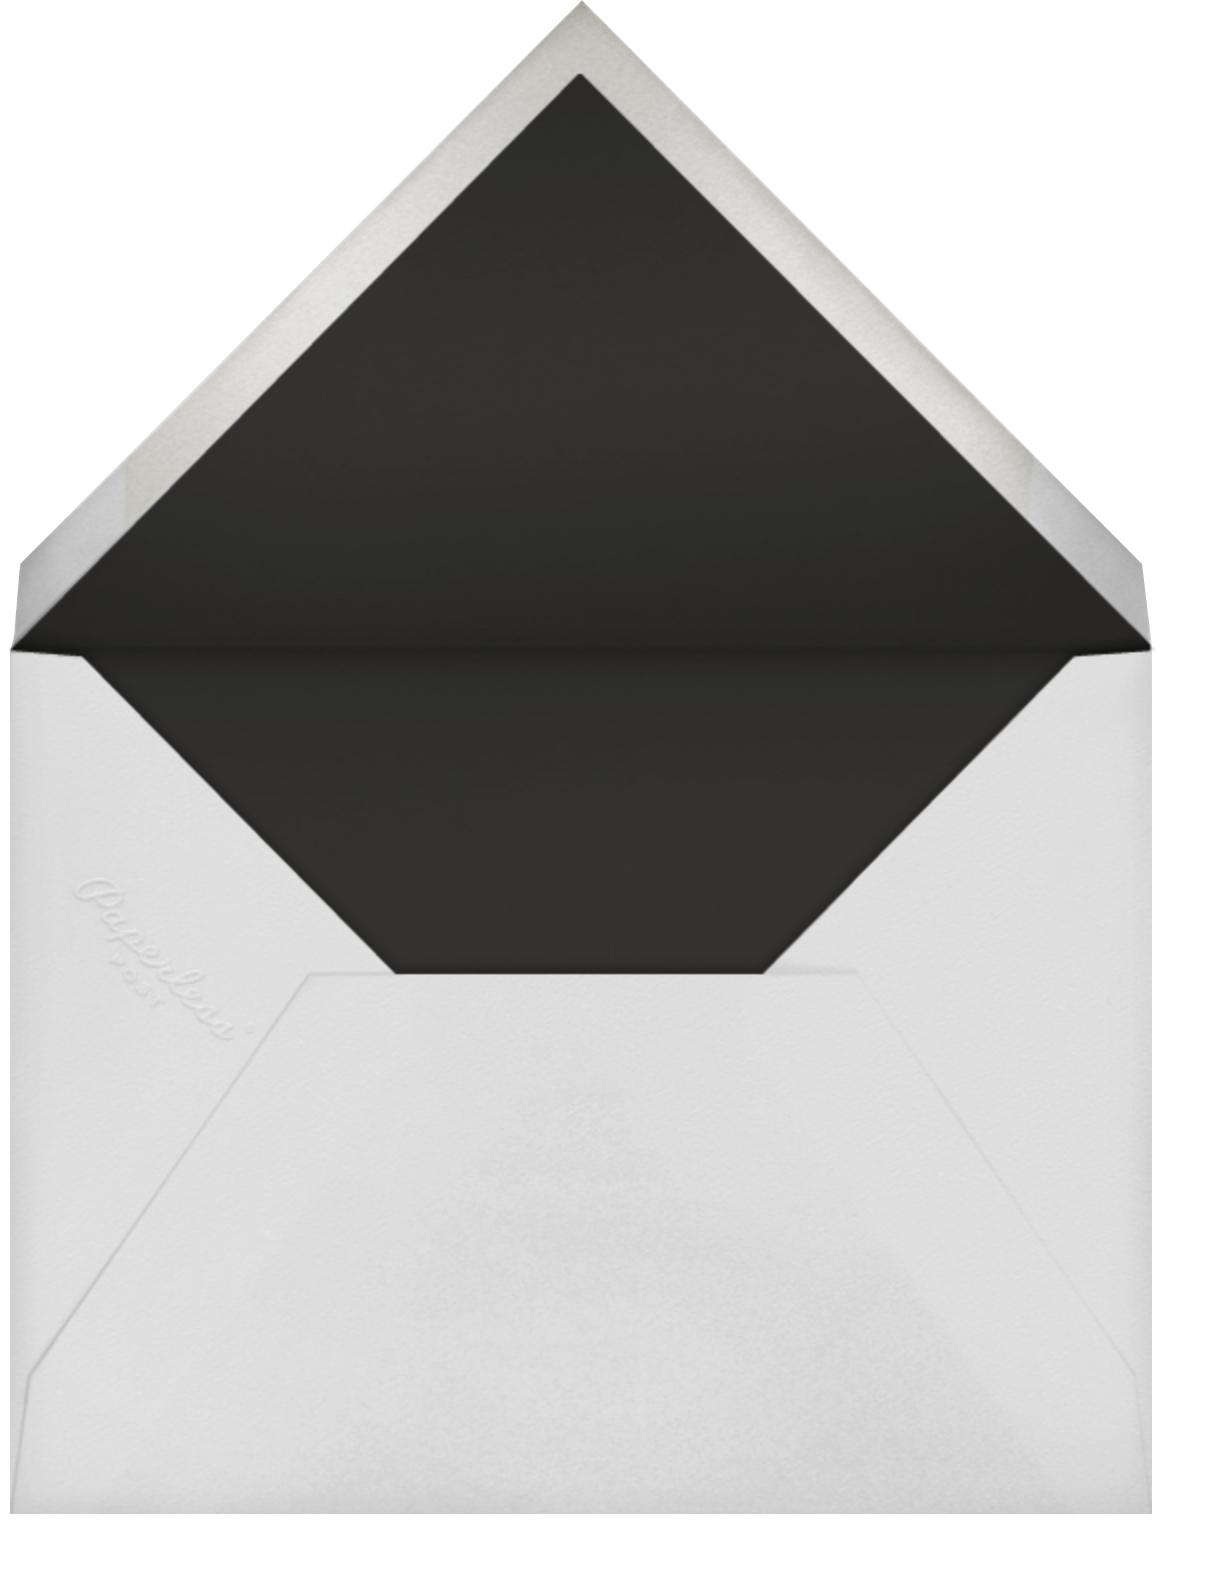 Chronology (Stationery) - White - Paperless Post - Personalized stationery - envelope back